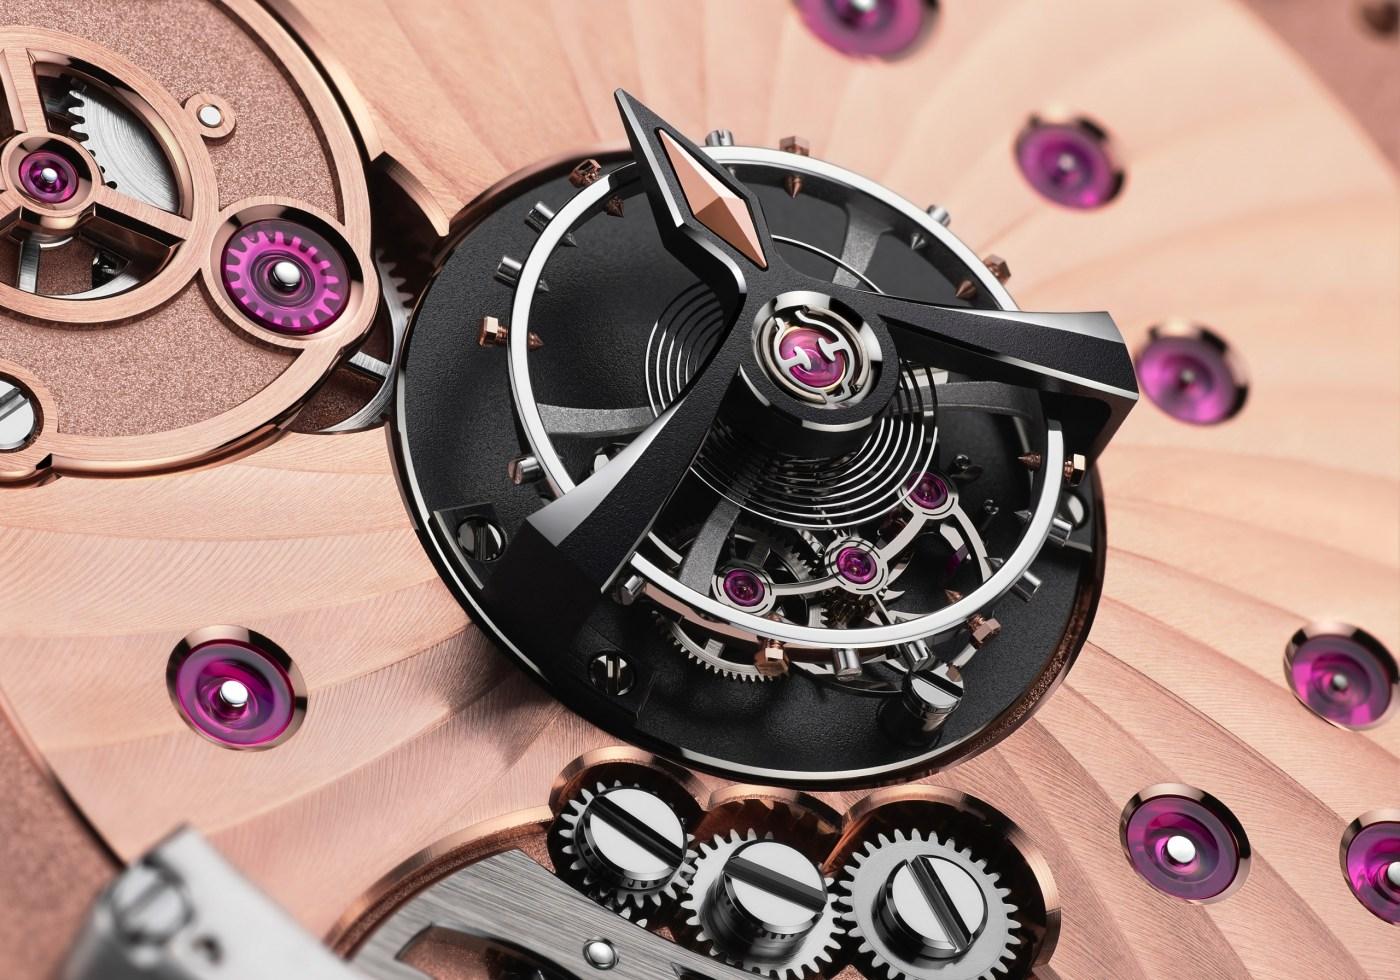 Omega De Ville Tourbillon Master Chronometer Numbered Edition power reserve indicator